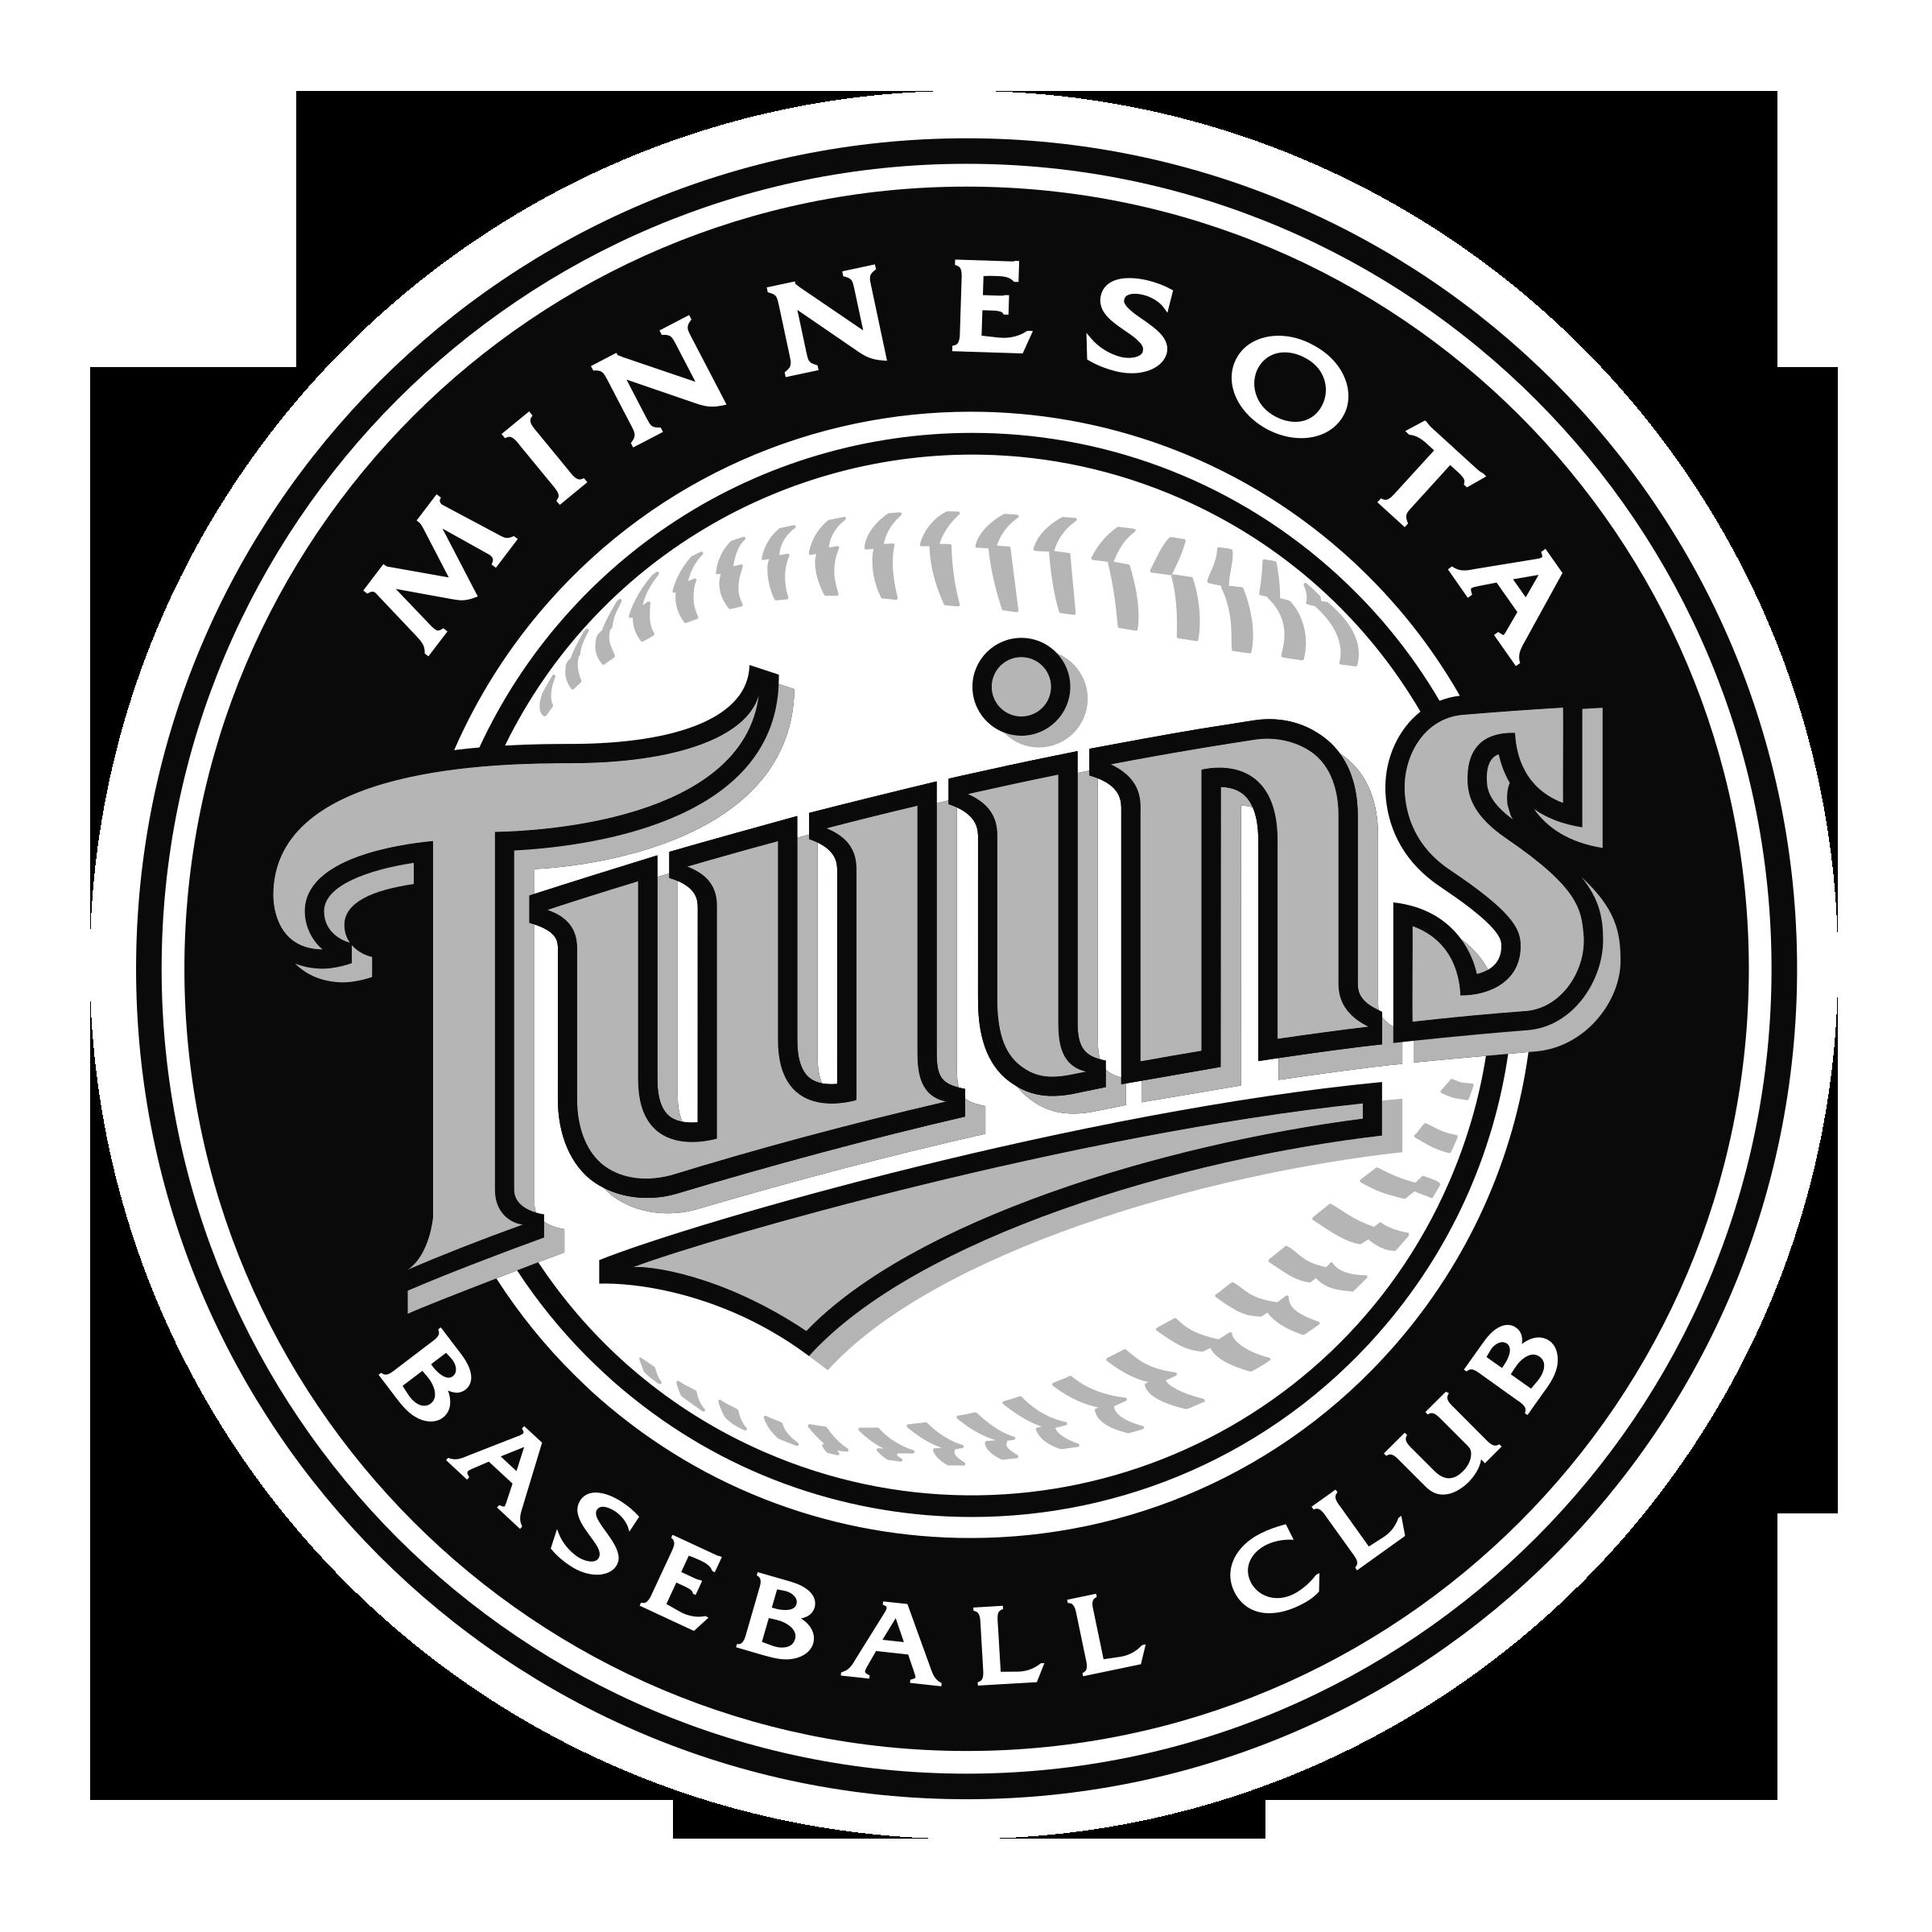 Minnesota twins baseball clipart clipart stock Minnesota Twins Logo PNG Transparent & SVG Vector - Freebie Supply clipart stock